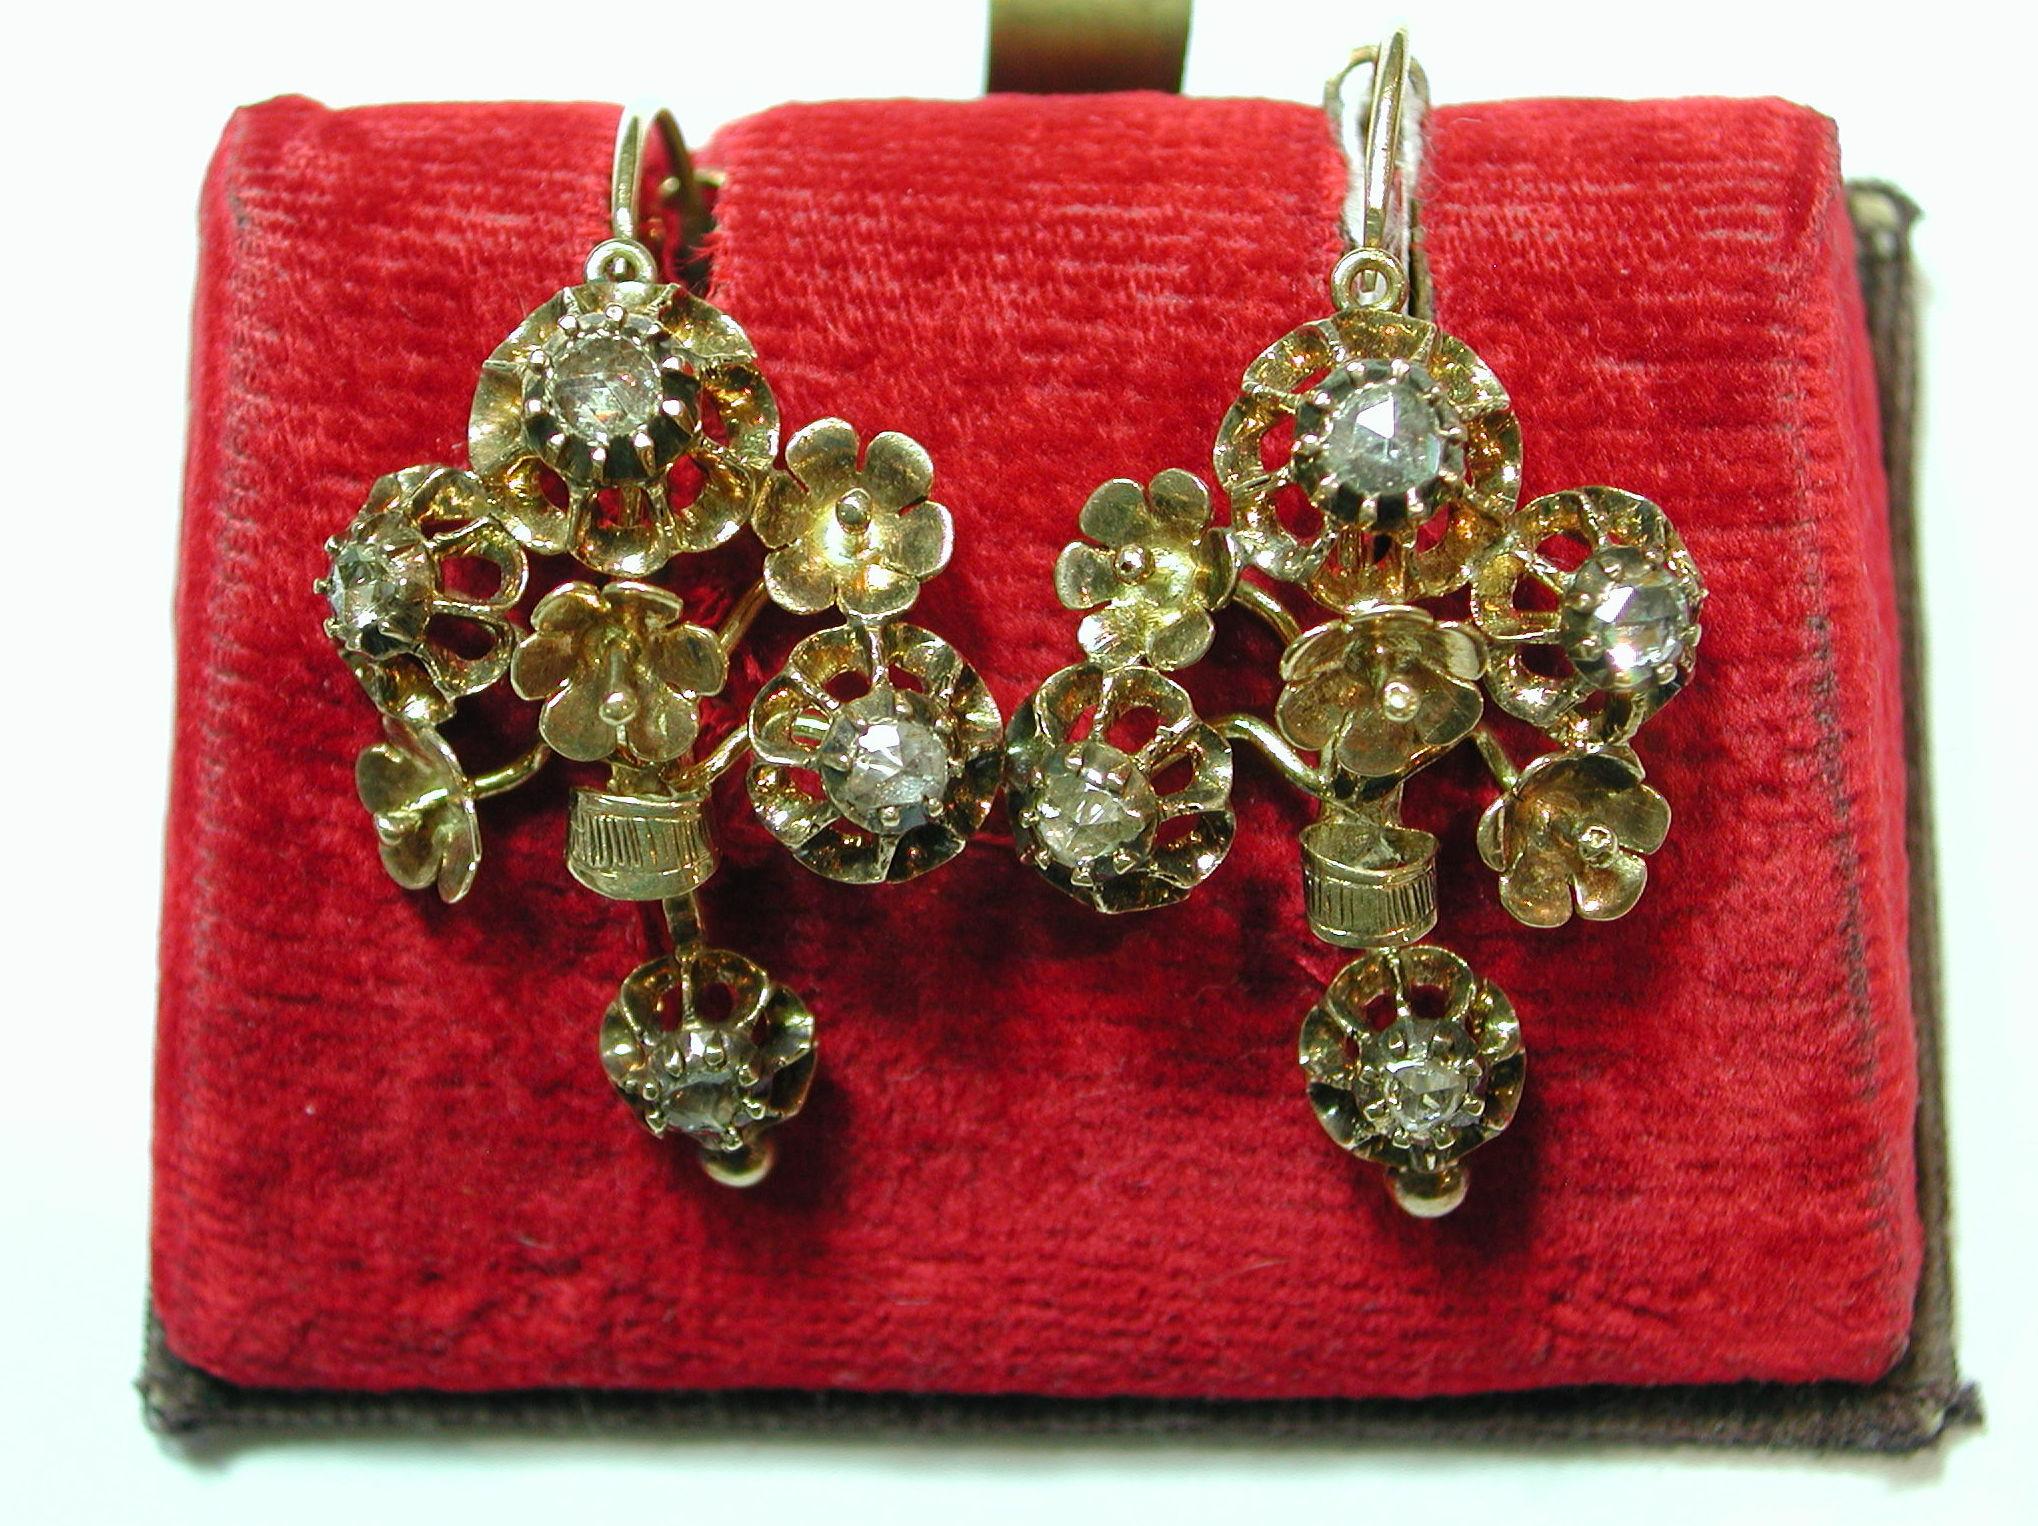 Pendientes con motivos florales de oro de 18k con diamantes. Mediados s.XIX: Catálogo de Antigua Joyeros